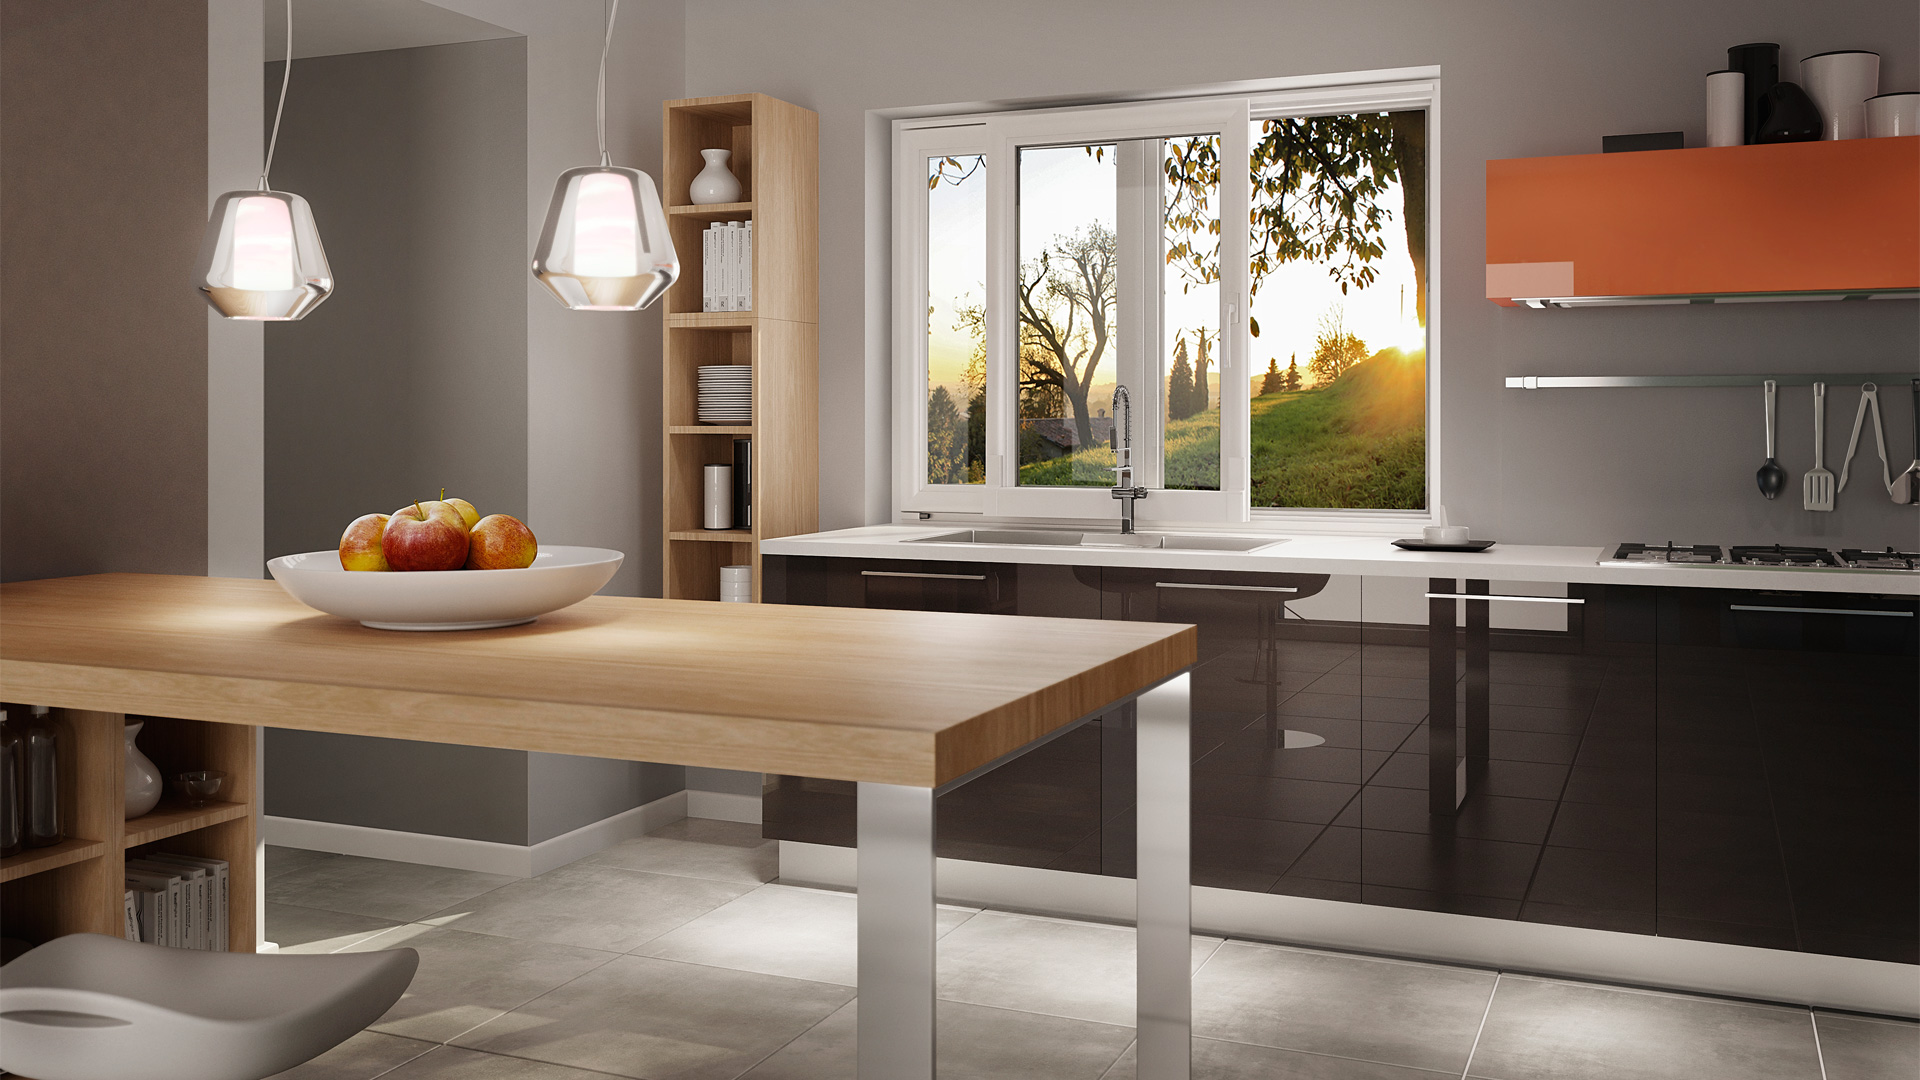 Arredare una piccola cucina consigli pratici blog oknoplast for Cucina moderna con finestra